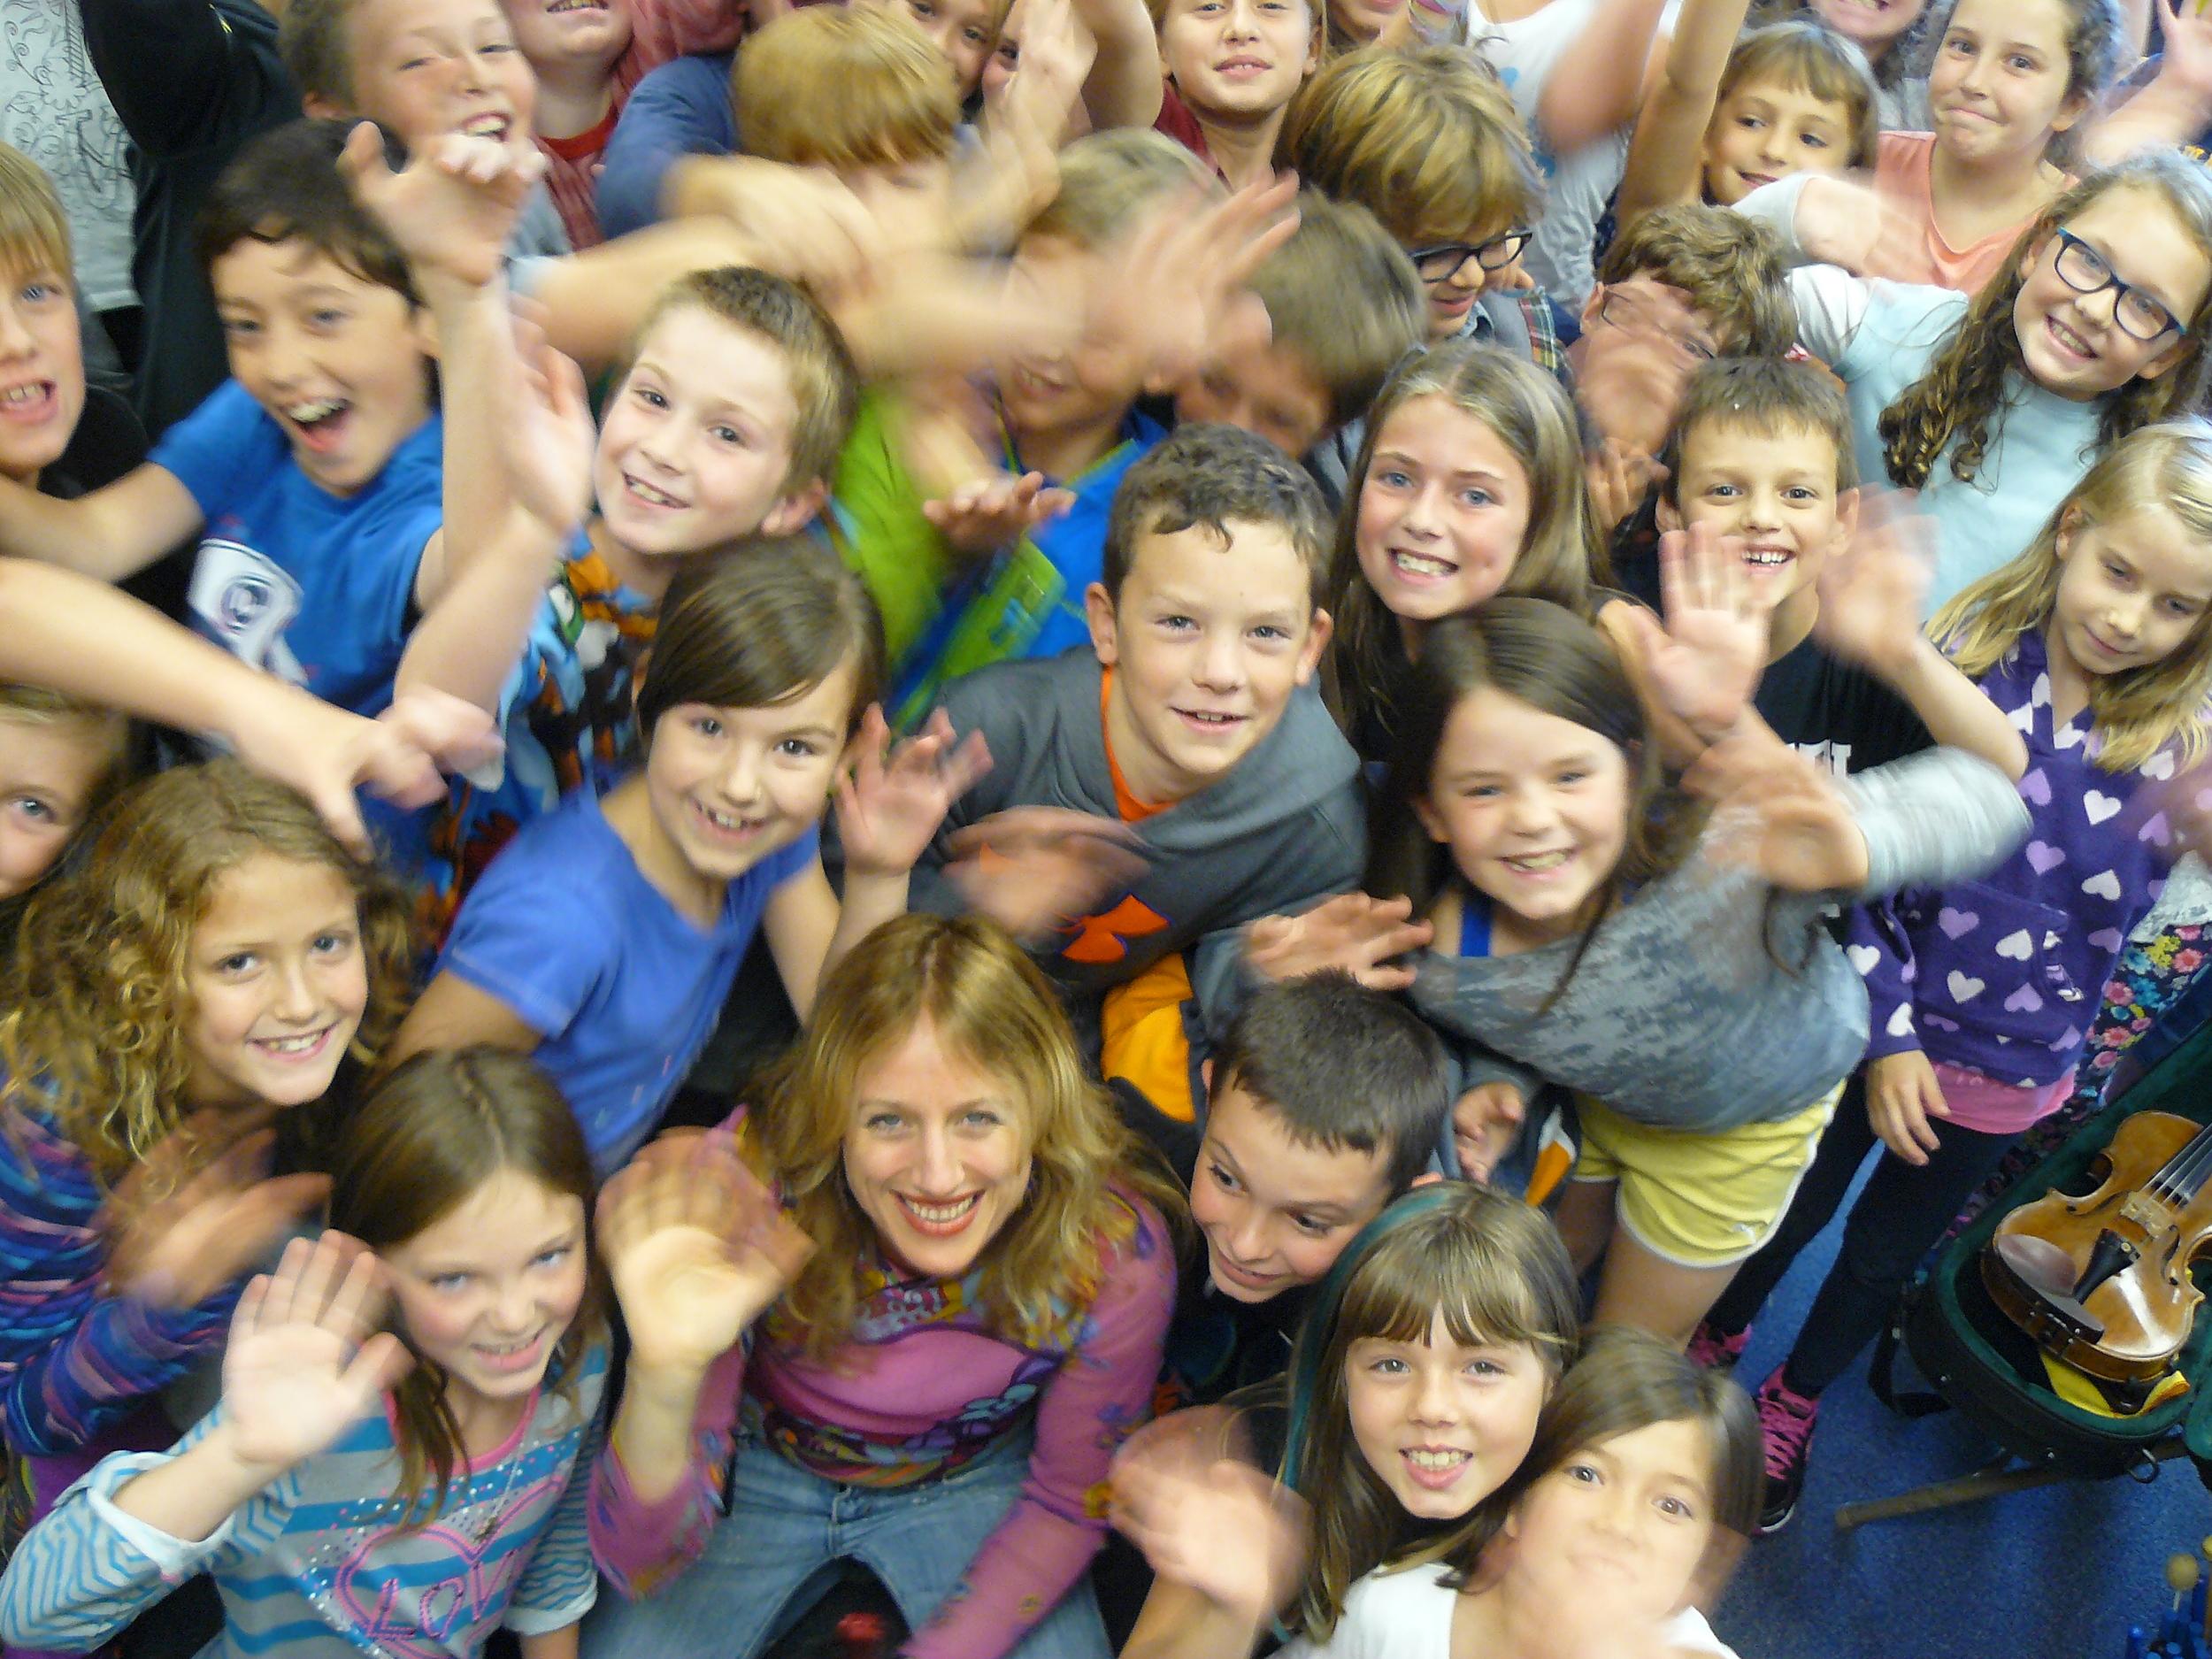 Fantastic kids!